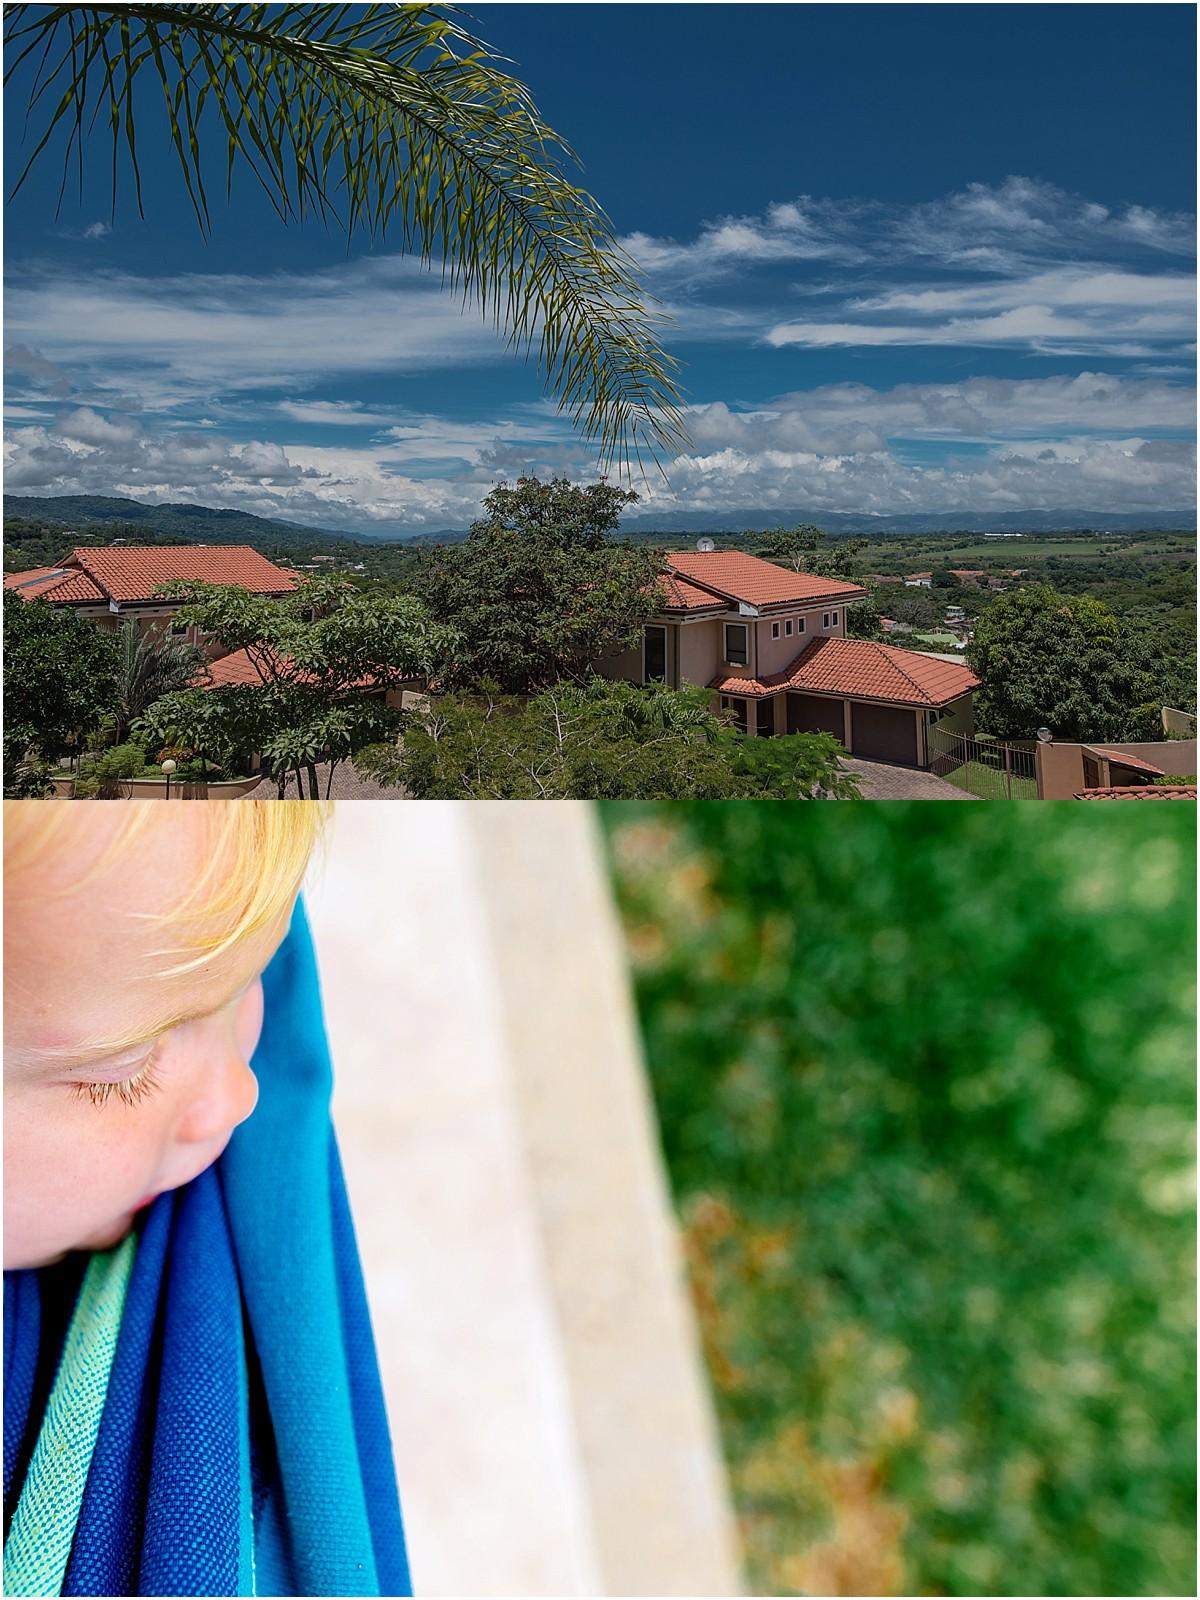 Ashley_Rogers_Photography_South_Florida_Photographer_Orlando_Photographer_Costa_Rica_Photographer_1190.jpg